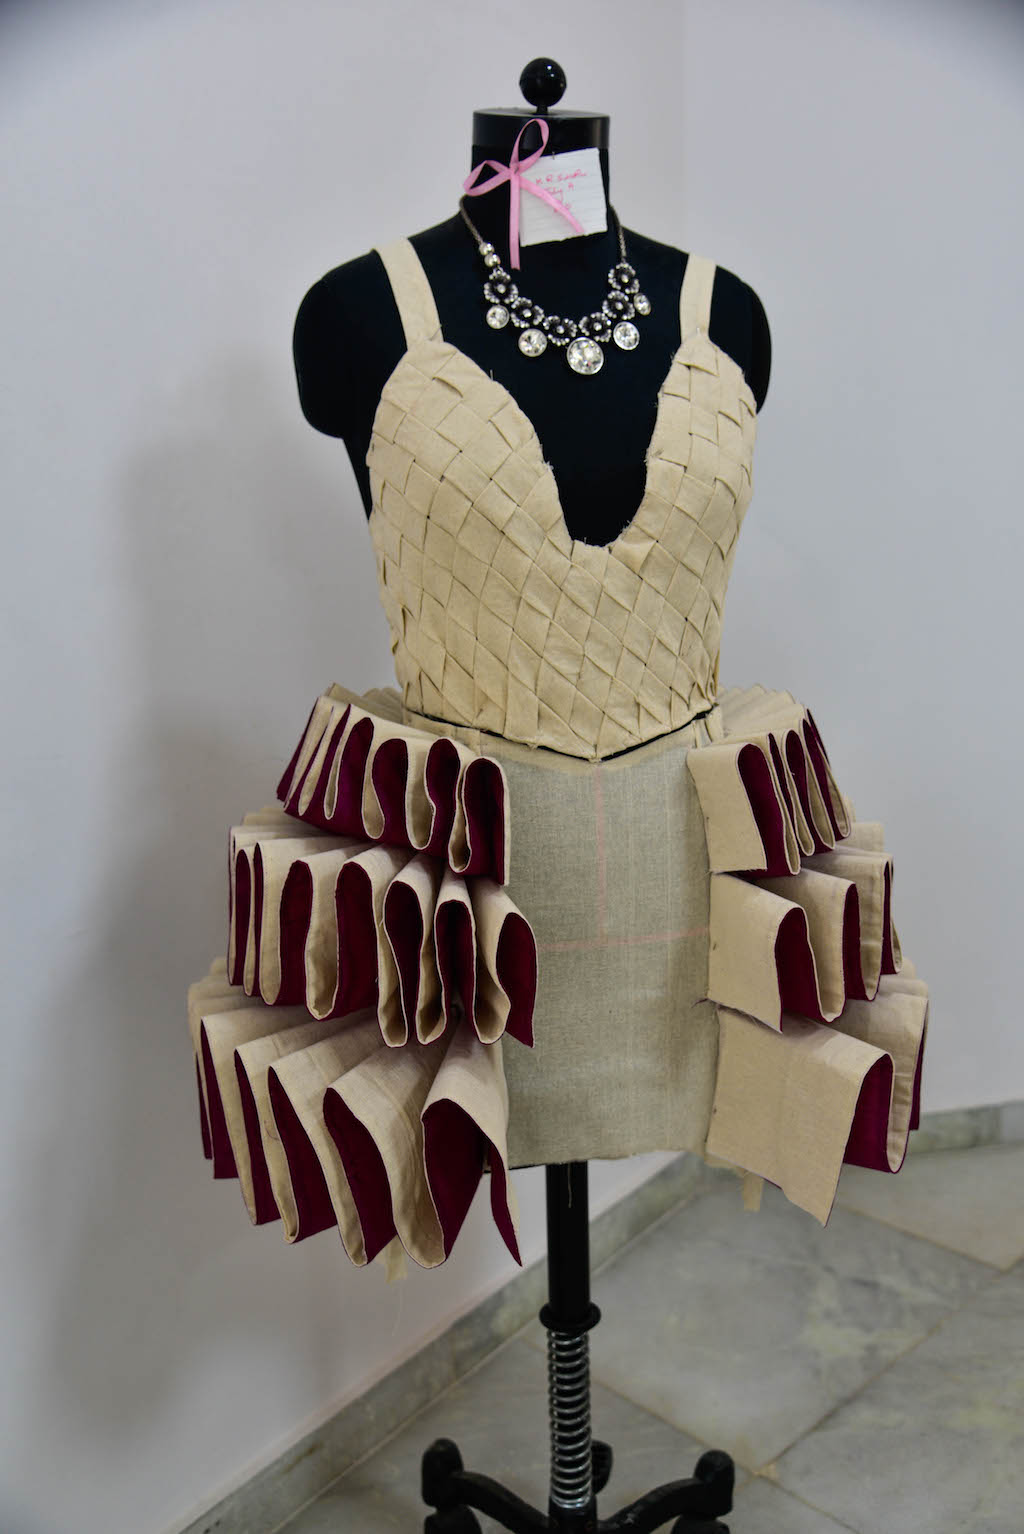 Dreams fold into Drapes | Fashion Draping exhibition at JD Institute dreams fold into drapes - DSC1384 - Dreams fold into Drapes | Fashion Draping exhibition at JD Institute